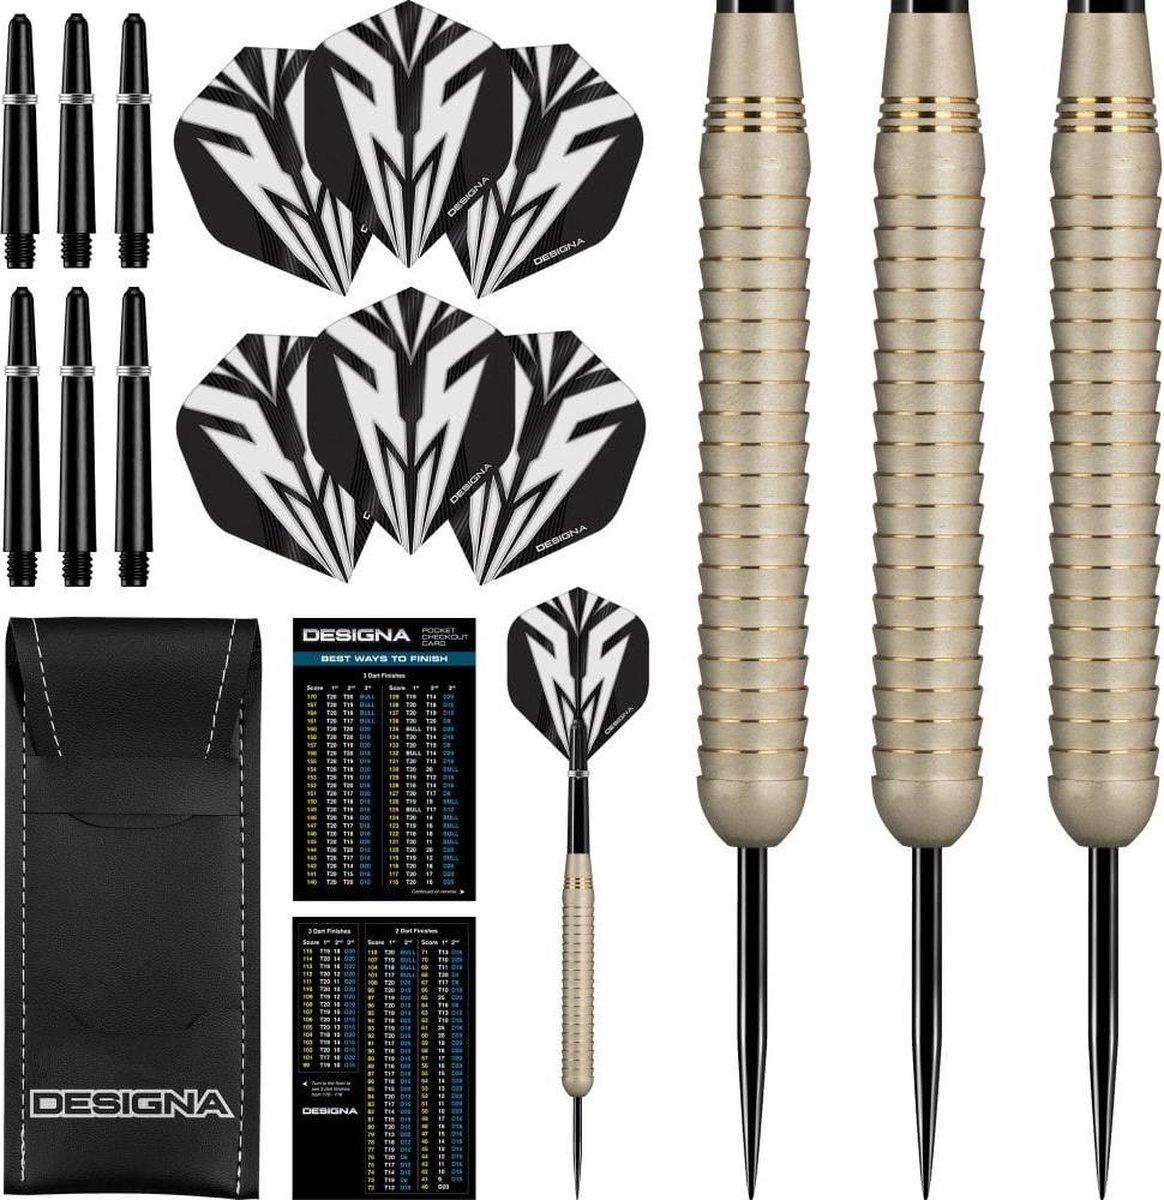 DESIGNA Mako Darts - Steel Tip Electro Brass - Shark Grip - Silver